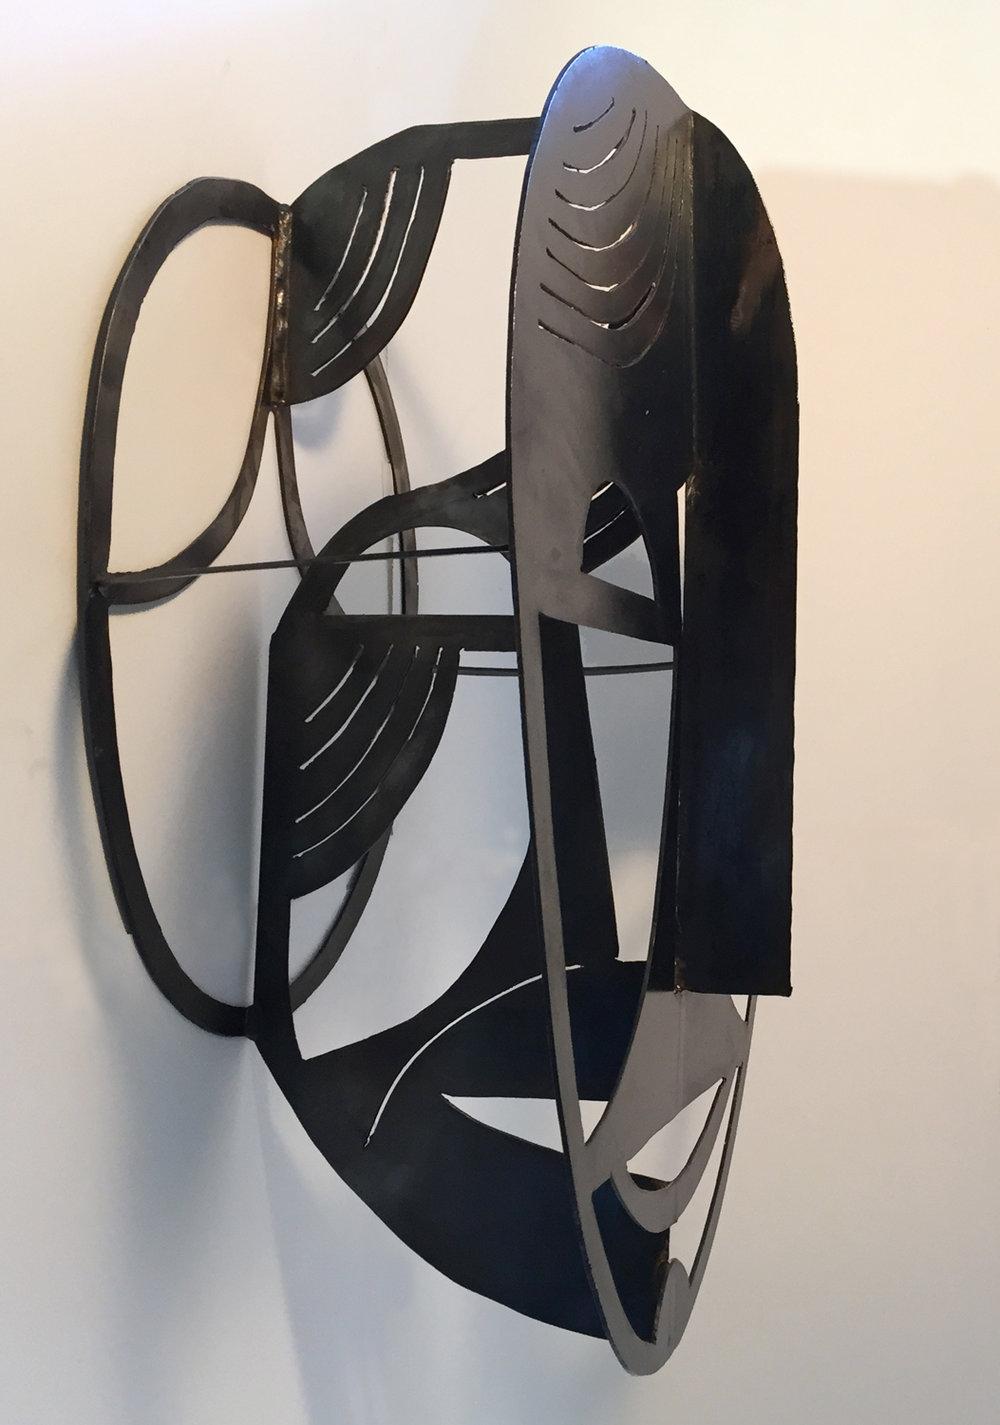 Joyful Face | Plasma Cut Steel and Welding